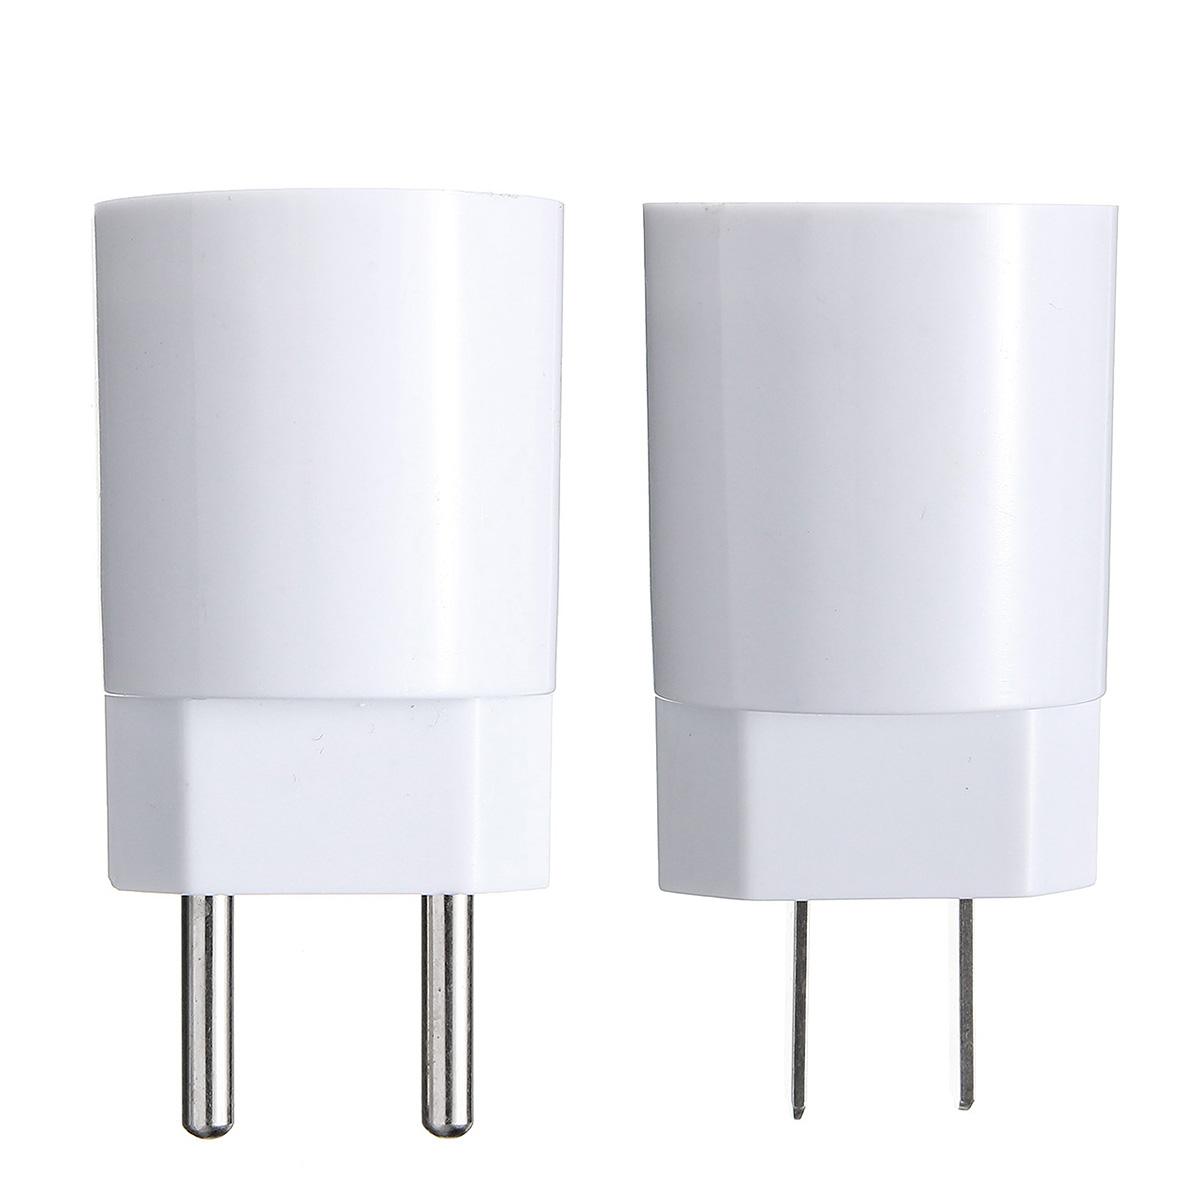 volts lighting watts sockets adapter product holders hardware jsp index black ace leviton light socket